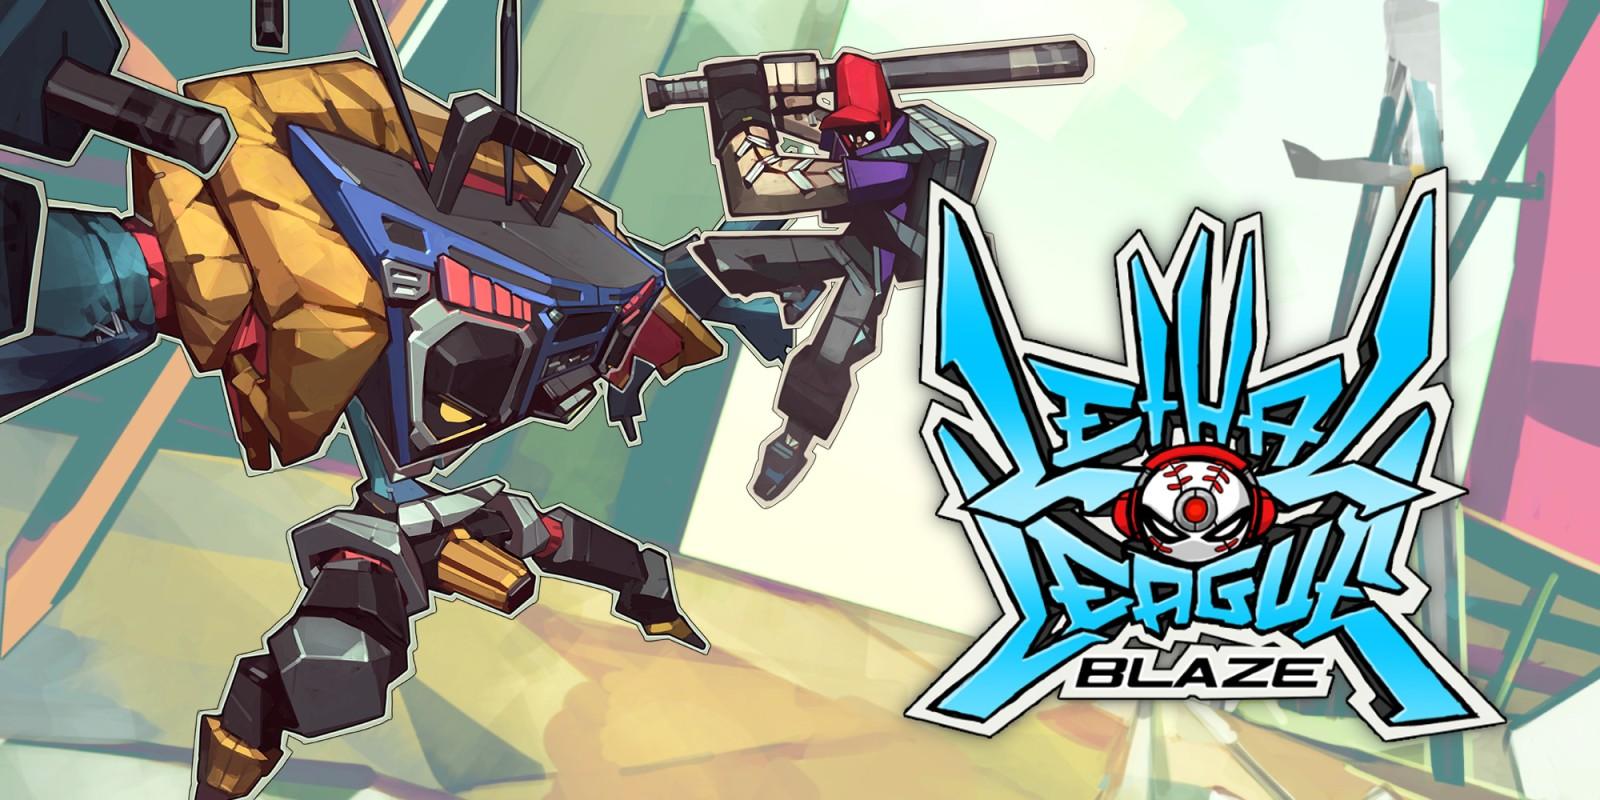 Lethal League Blaze Aplicacoes De Download Da Nintendo Switch